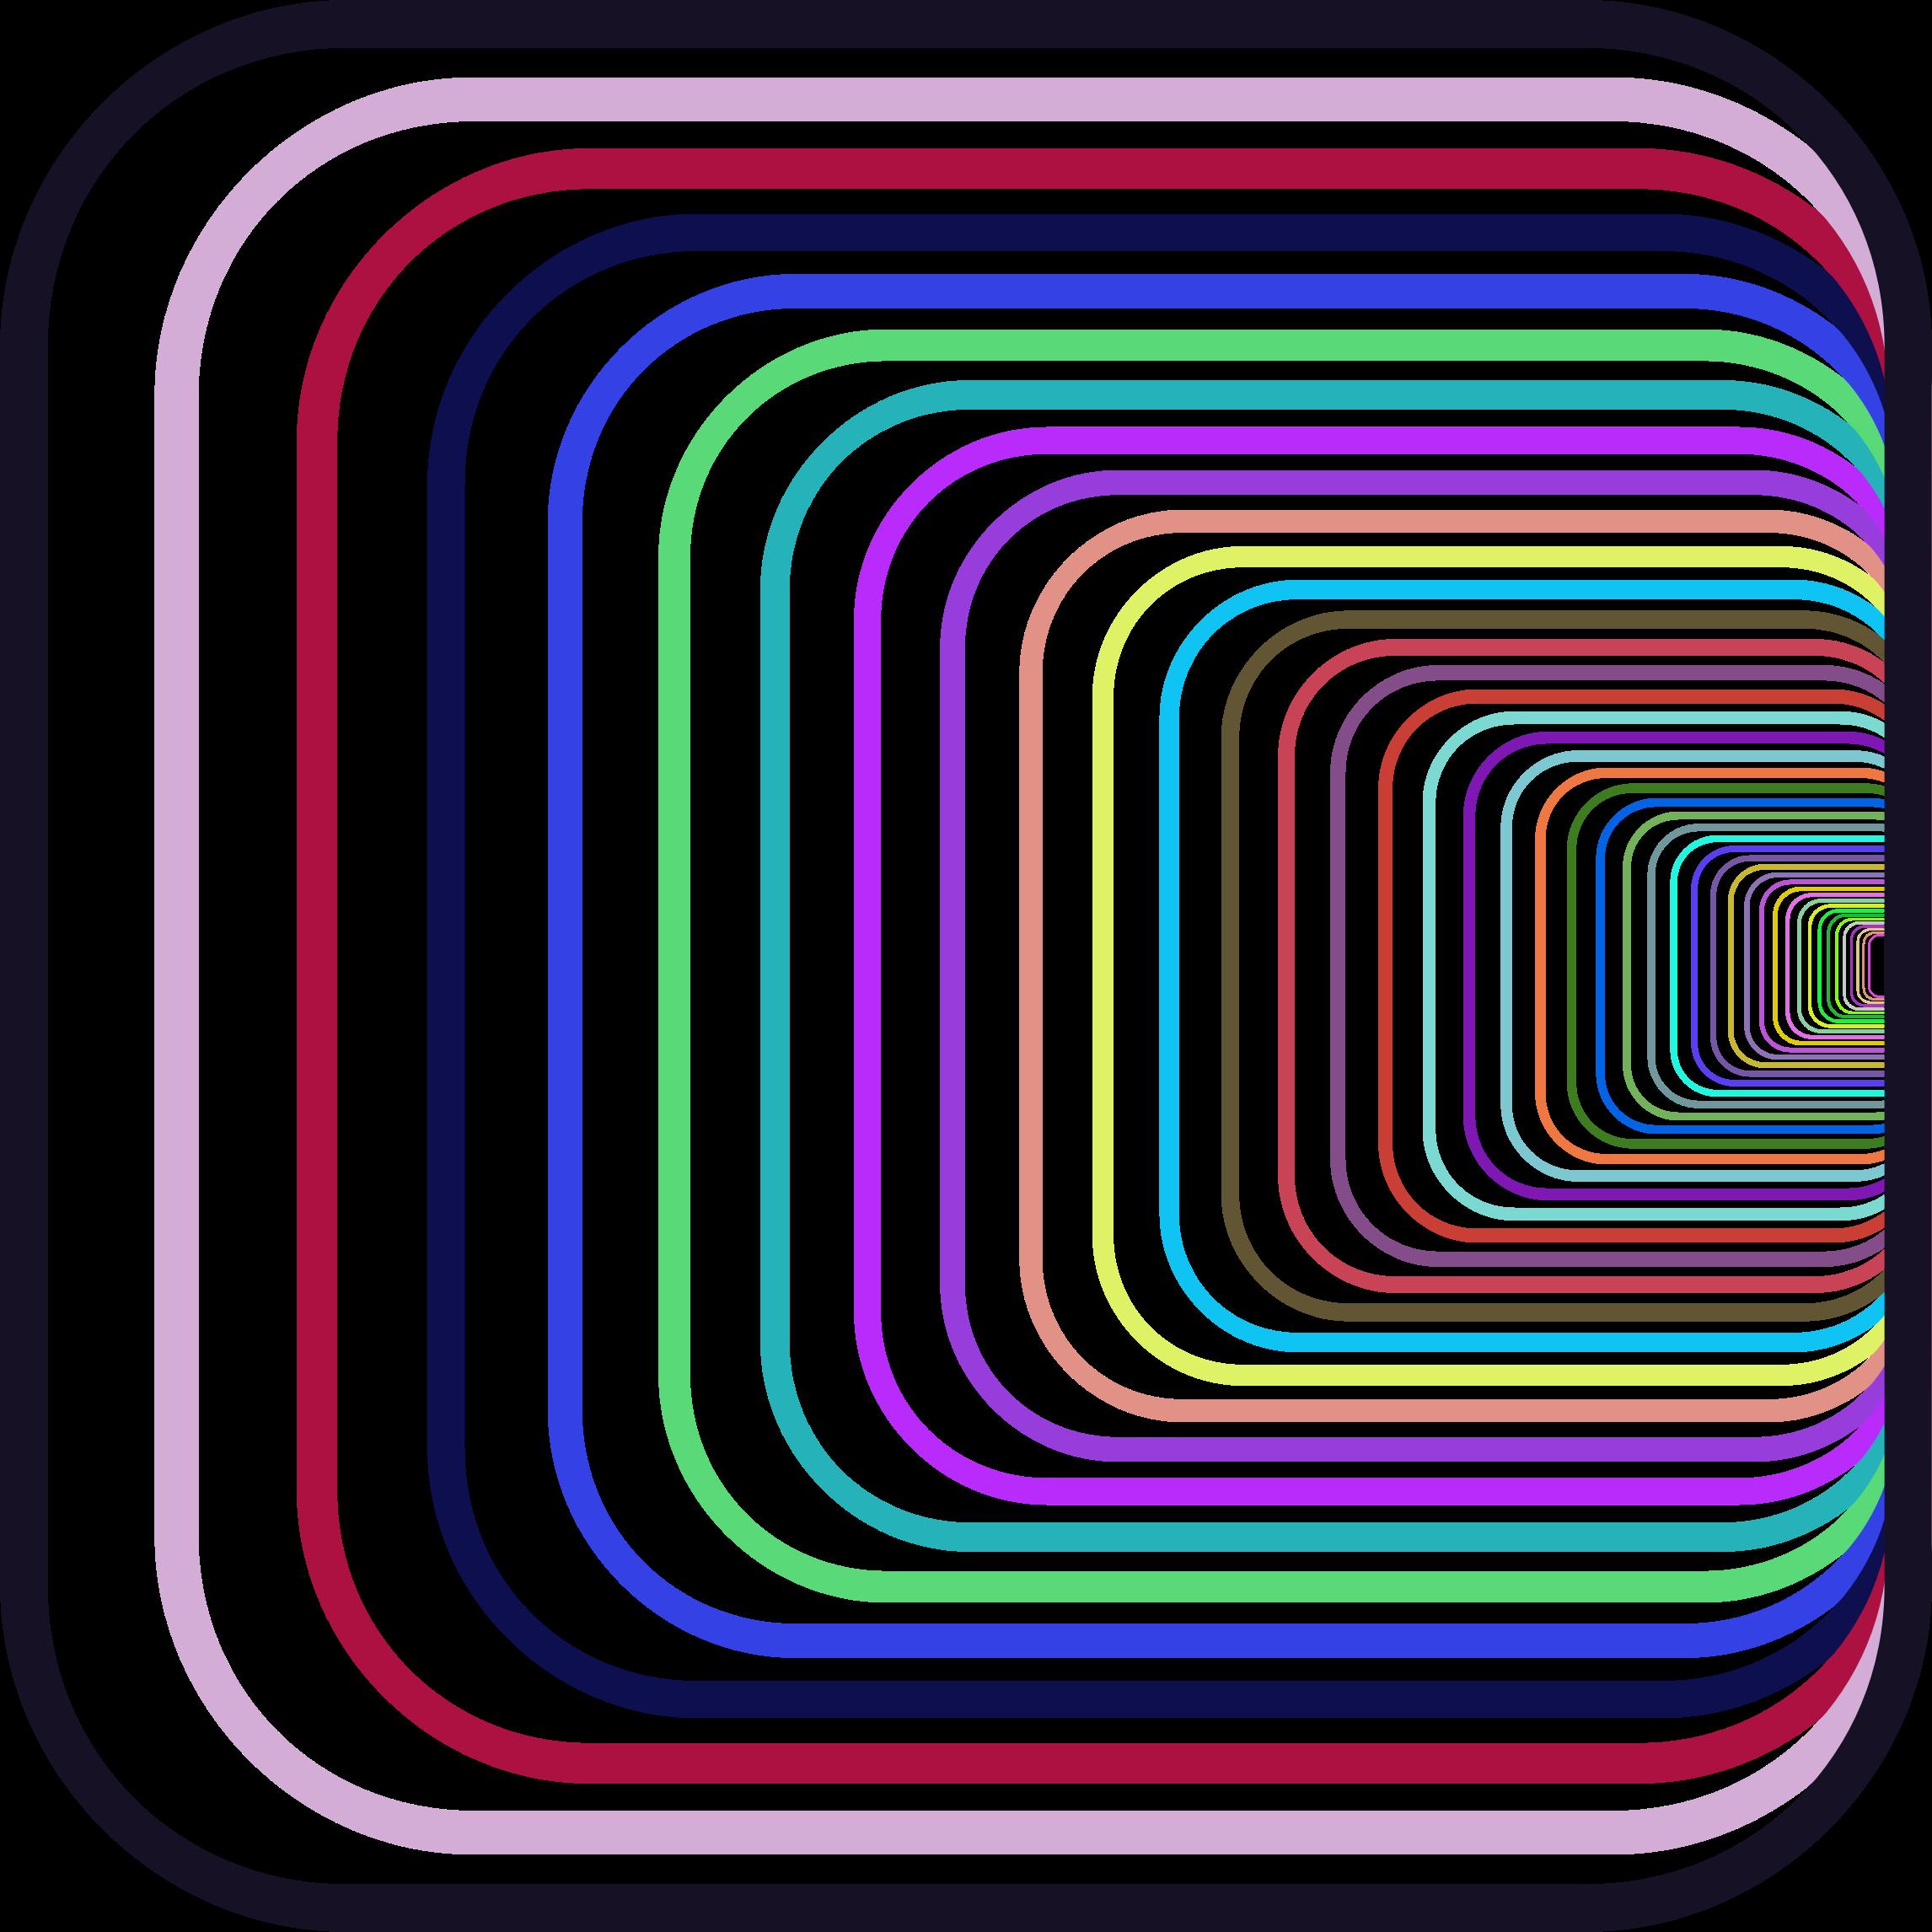 Magic clipart illusion. At getdrawings com free